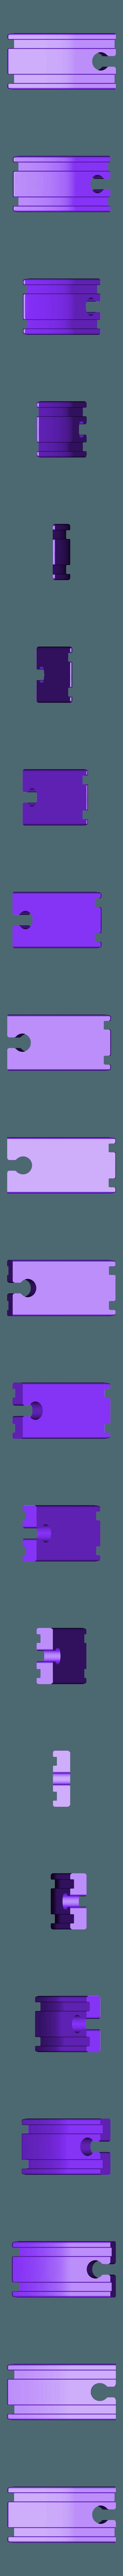 Off-Ramp Track.stl Download free STL file Toy Train Tracks • 3D printer design, FerryTeacher